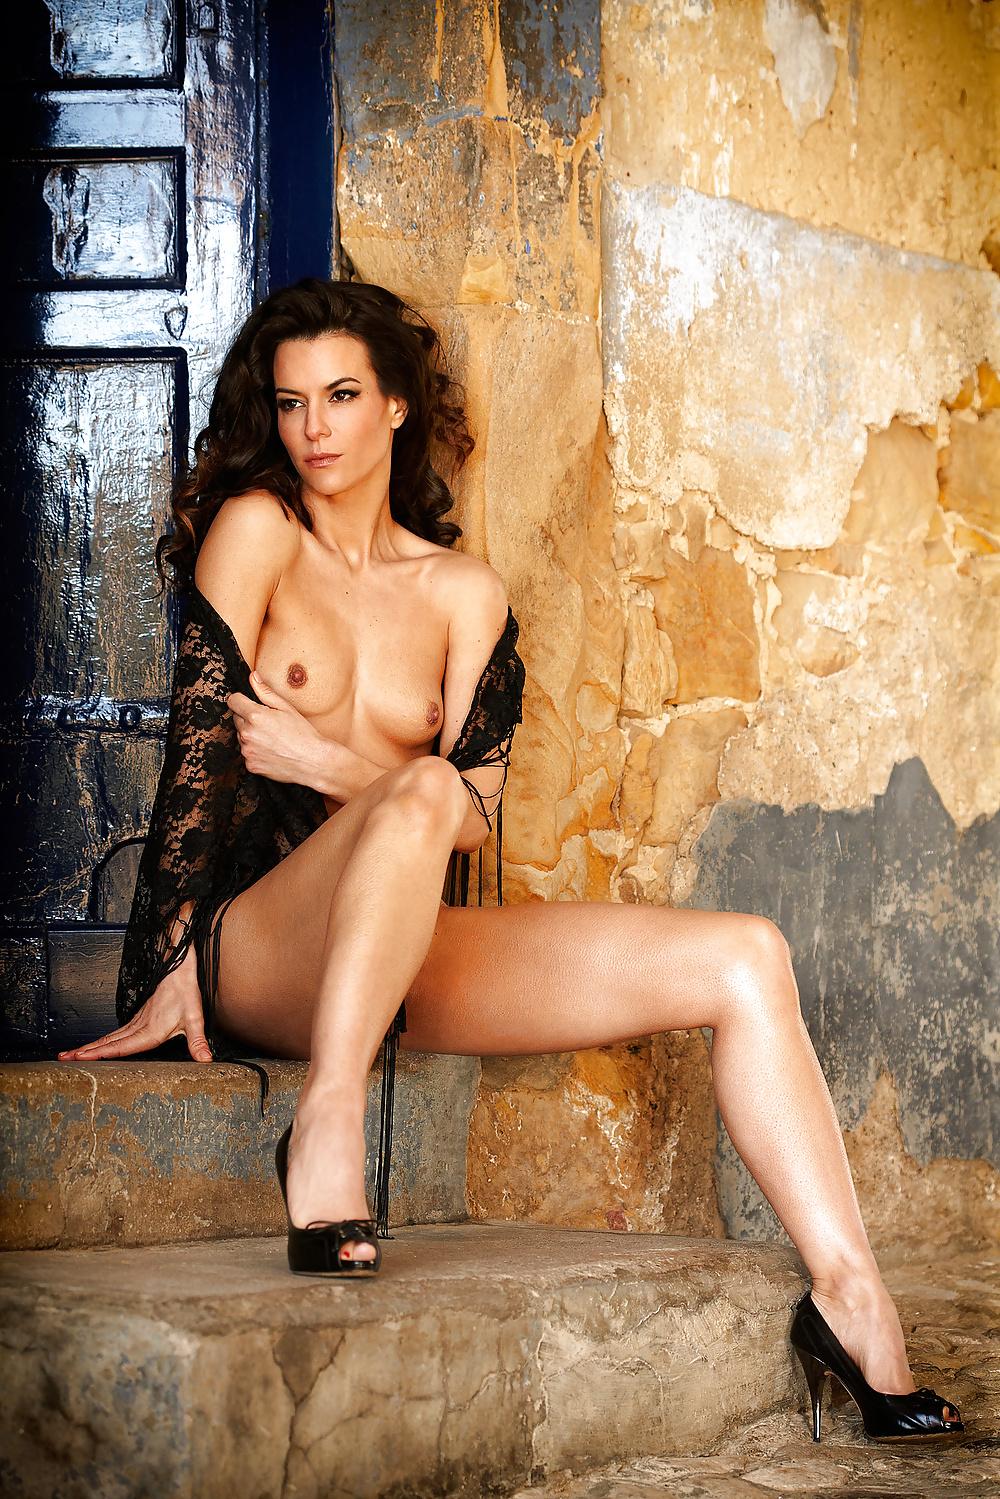 Nackt unter playboy uns Claudelle Deckert: